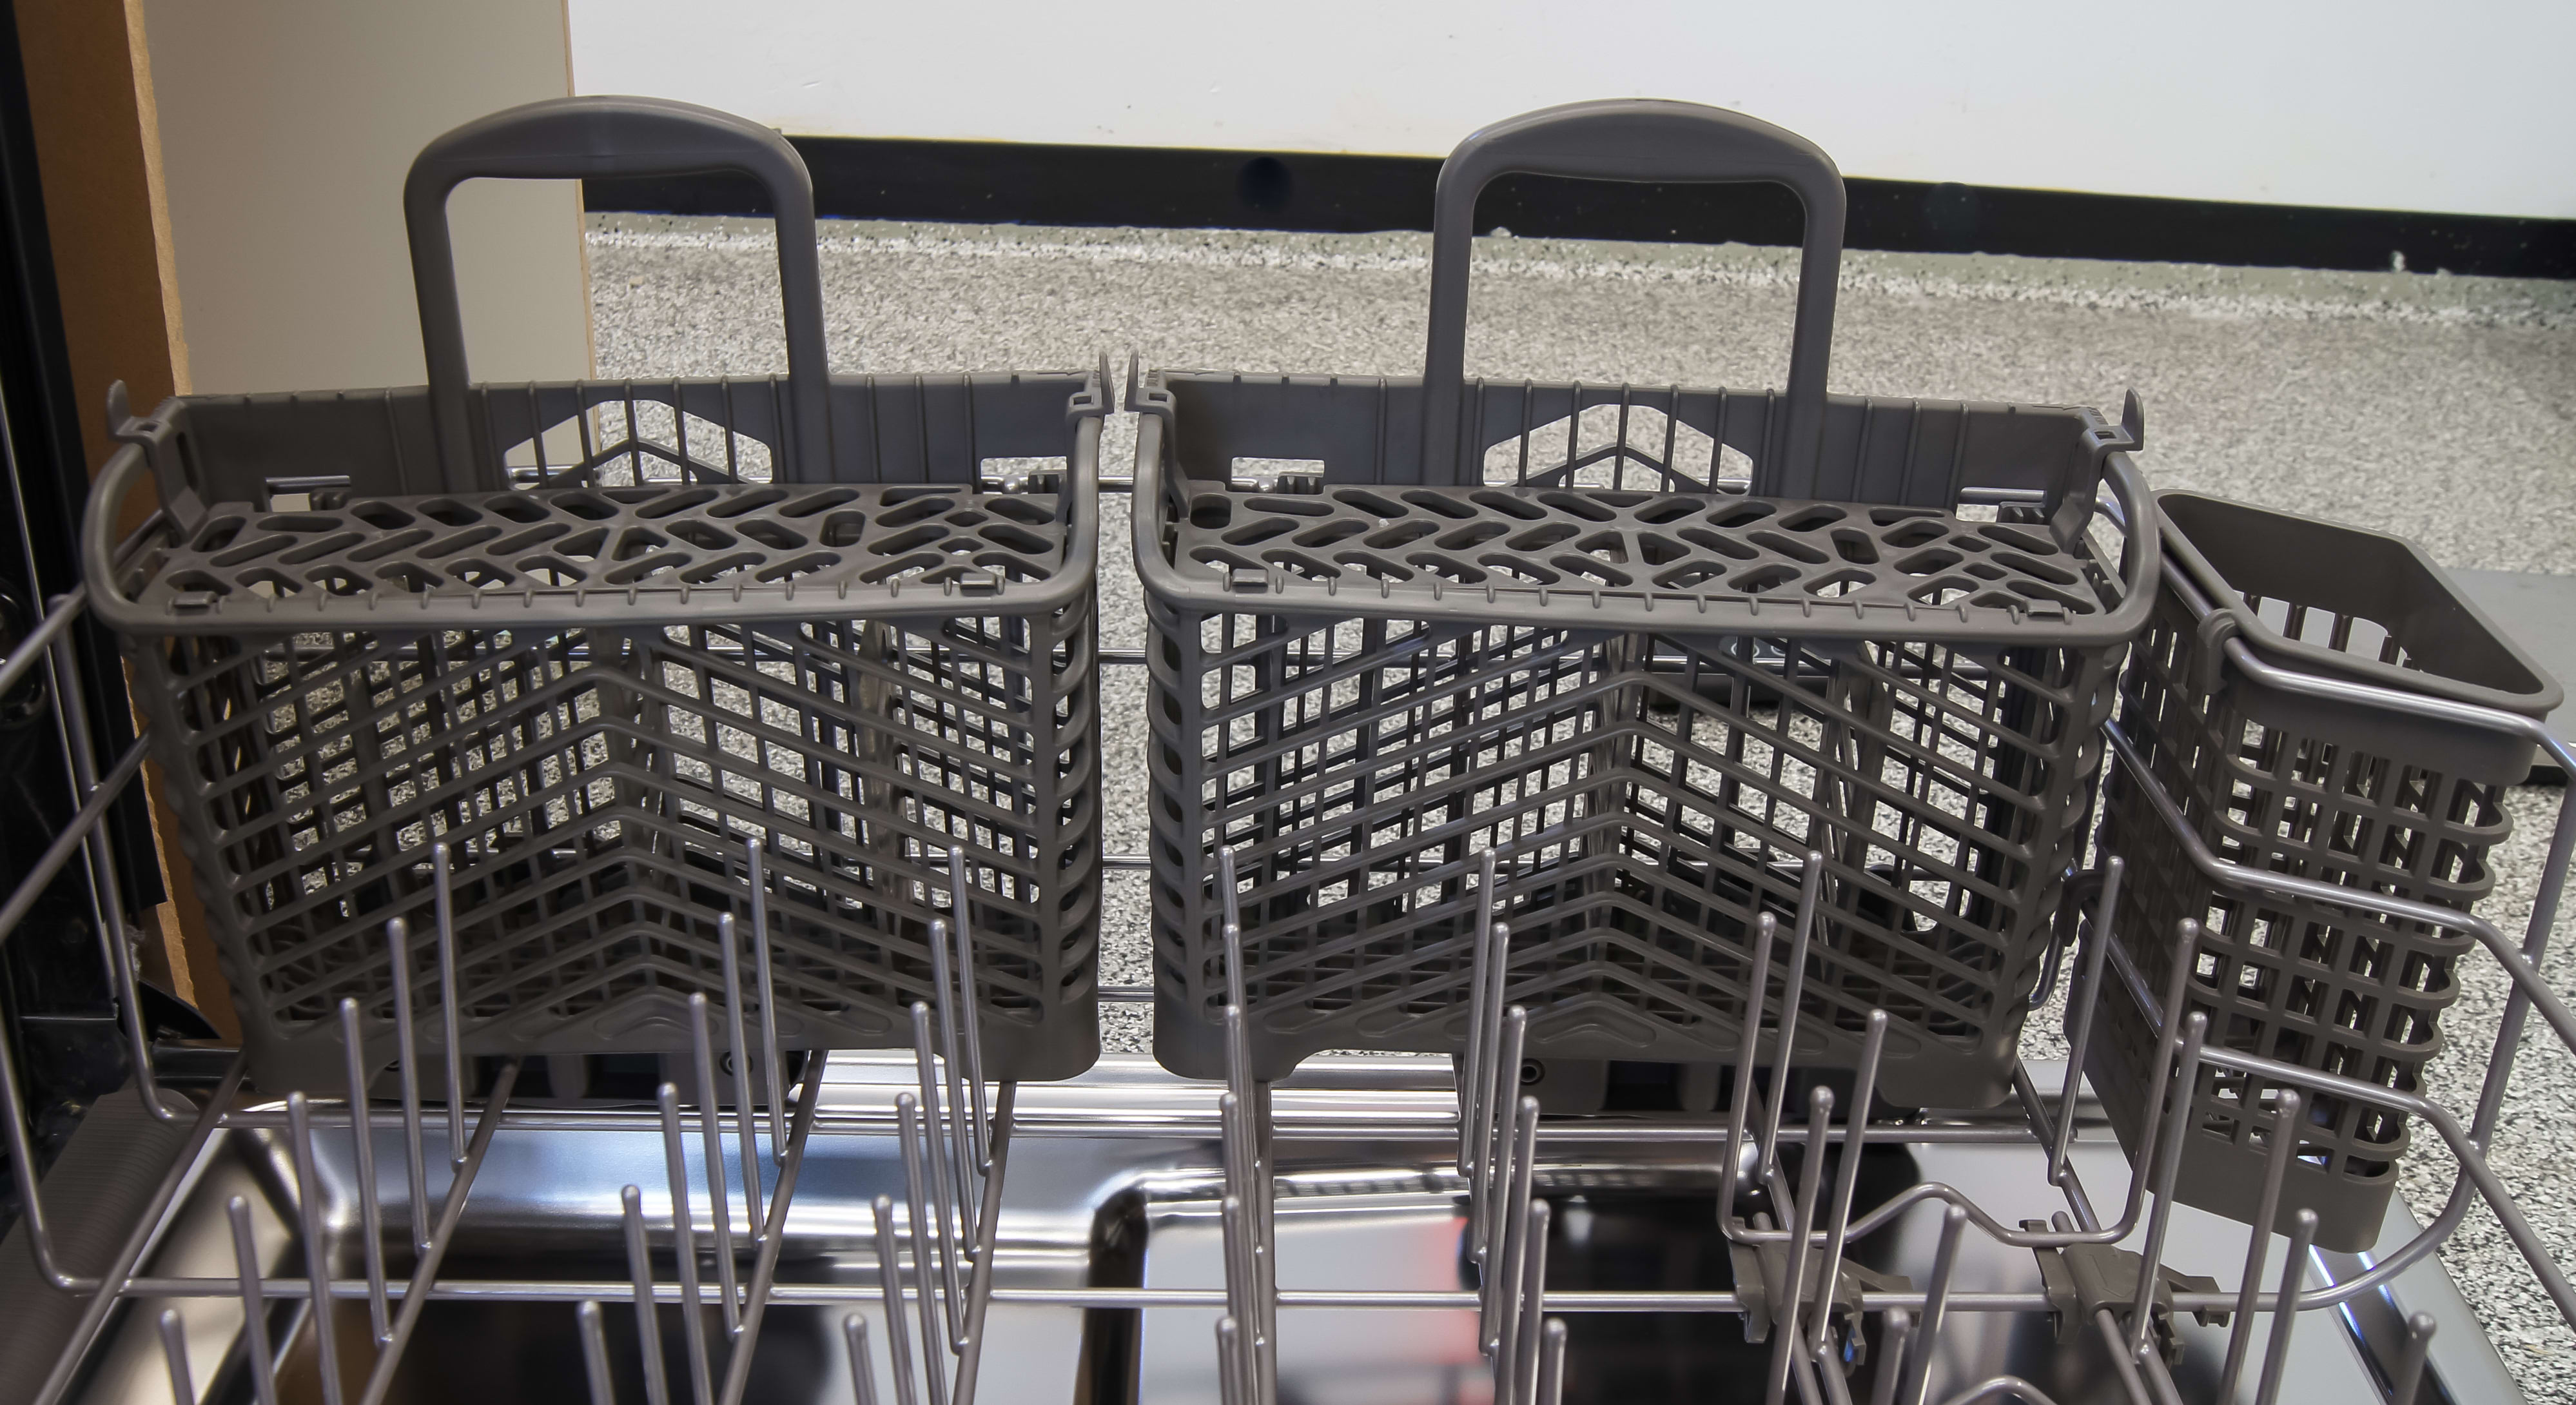 KitchenAid KDTM354DSS cutlery basket